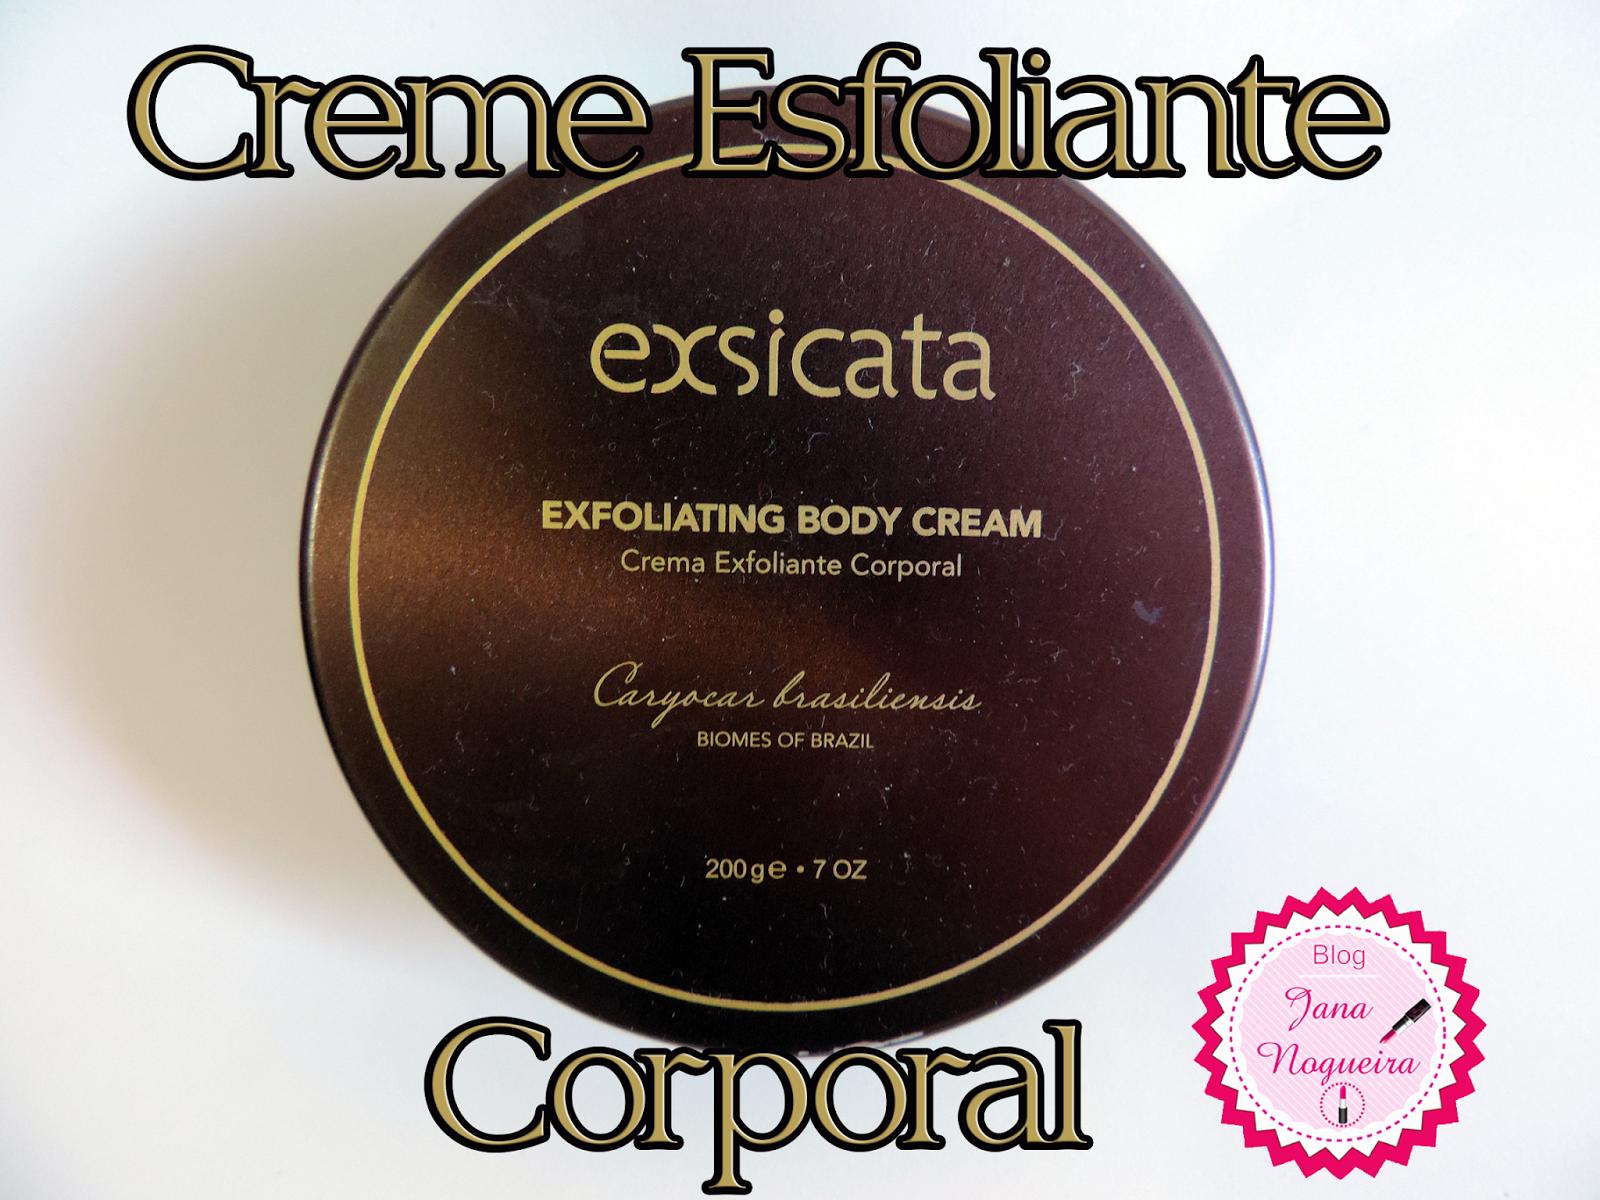 Esfoliante Corporal Exsicata - The Best!